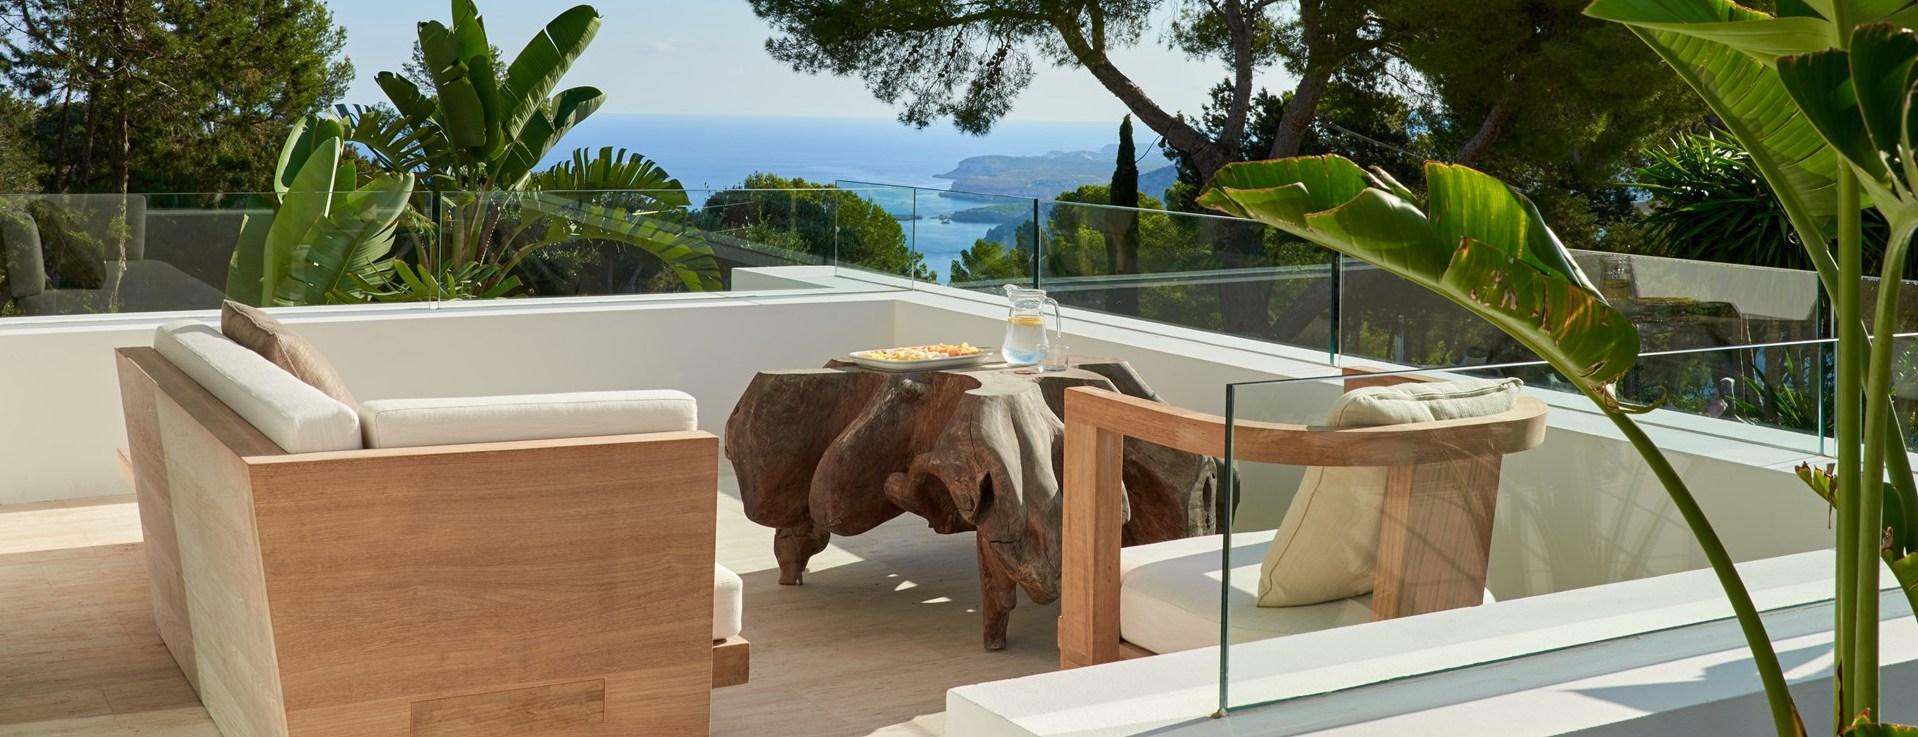 villa-can-castello-sun-terrace